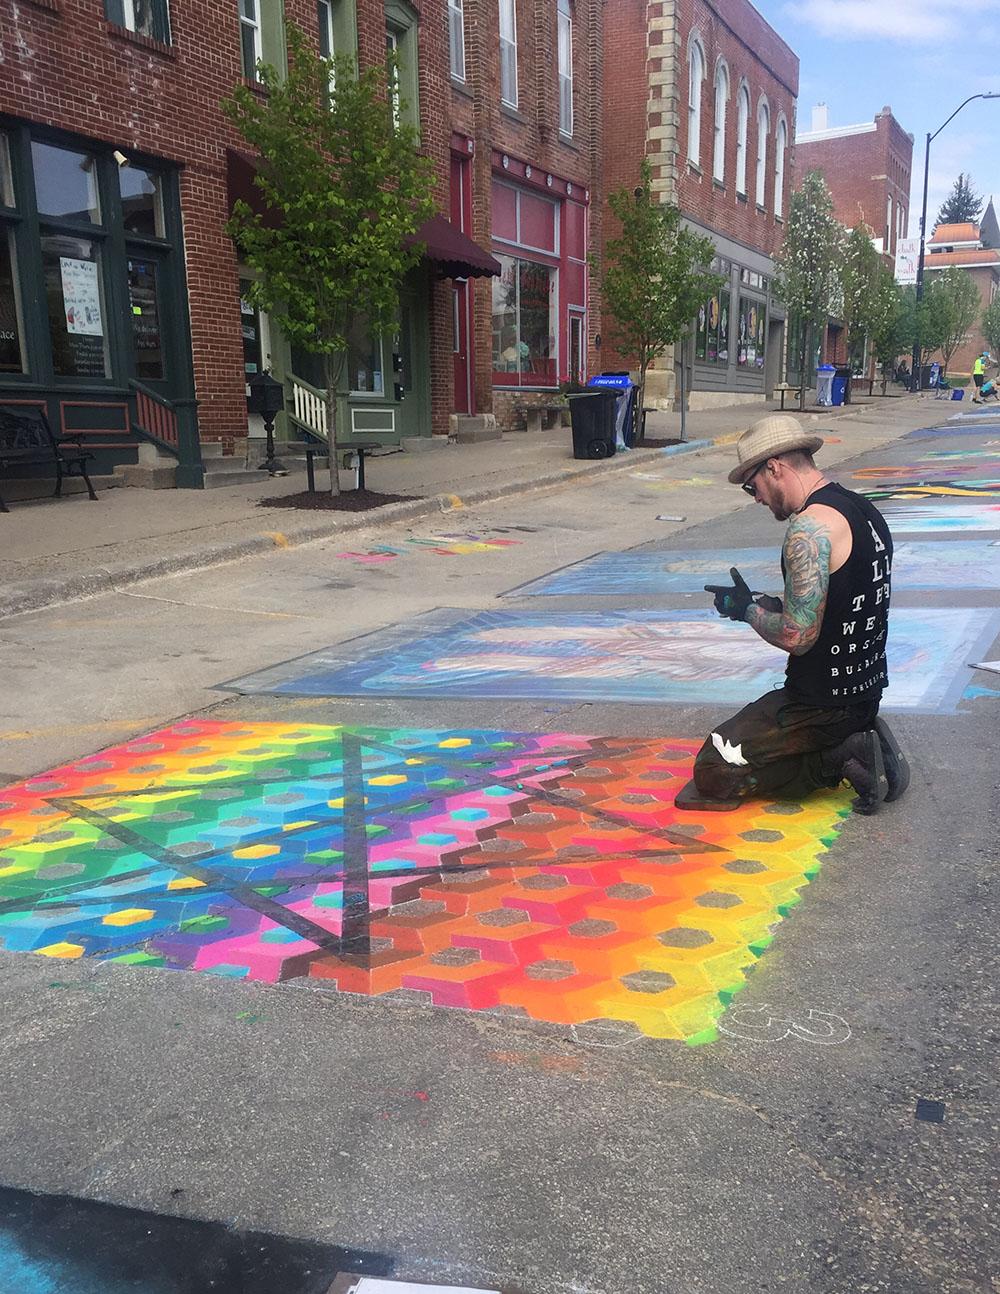 Artist creating rainbow chalk art during Mount Vernon's 2019 Chalk the Walk